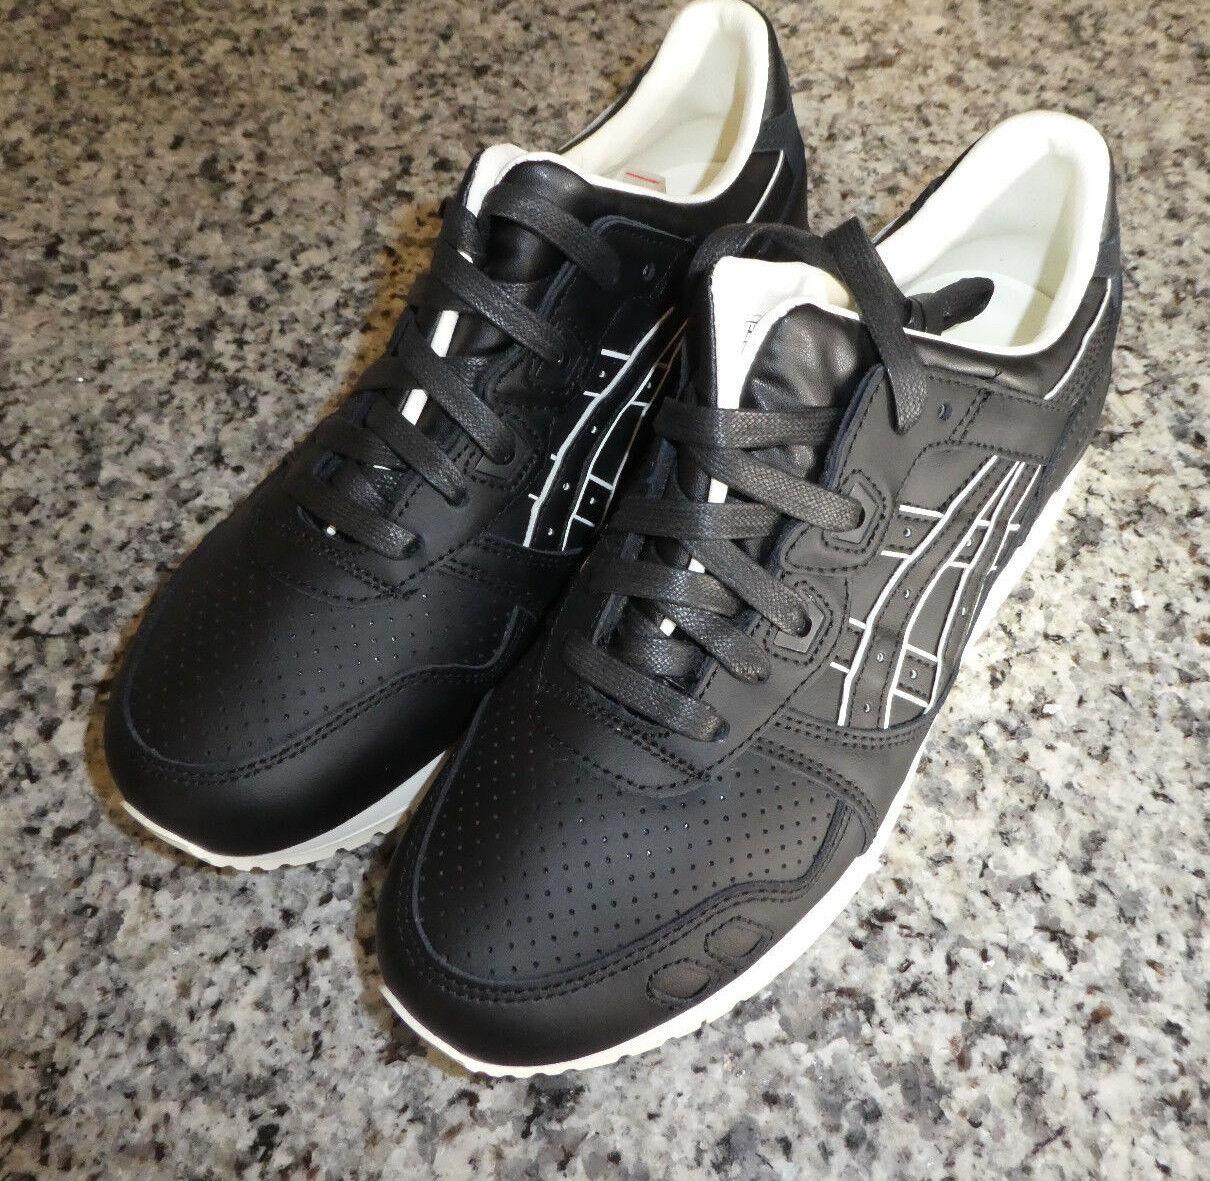 Asics Gel Lyte III h6s3l zapatos cuero negro Nueva h6s3l III 9090 6d8f59